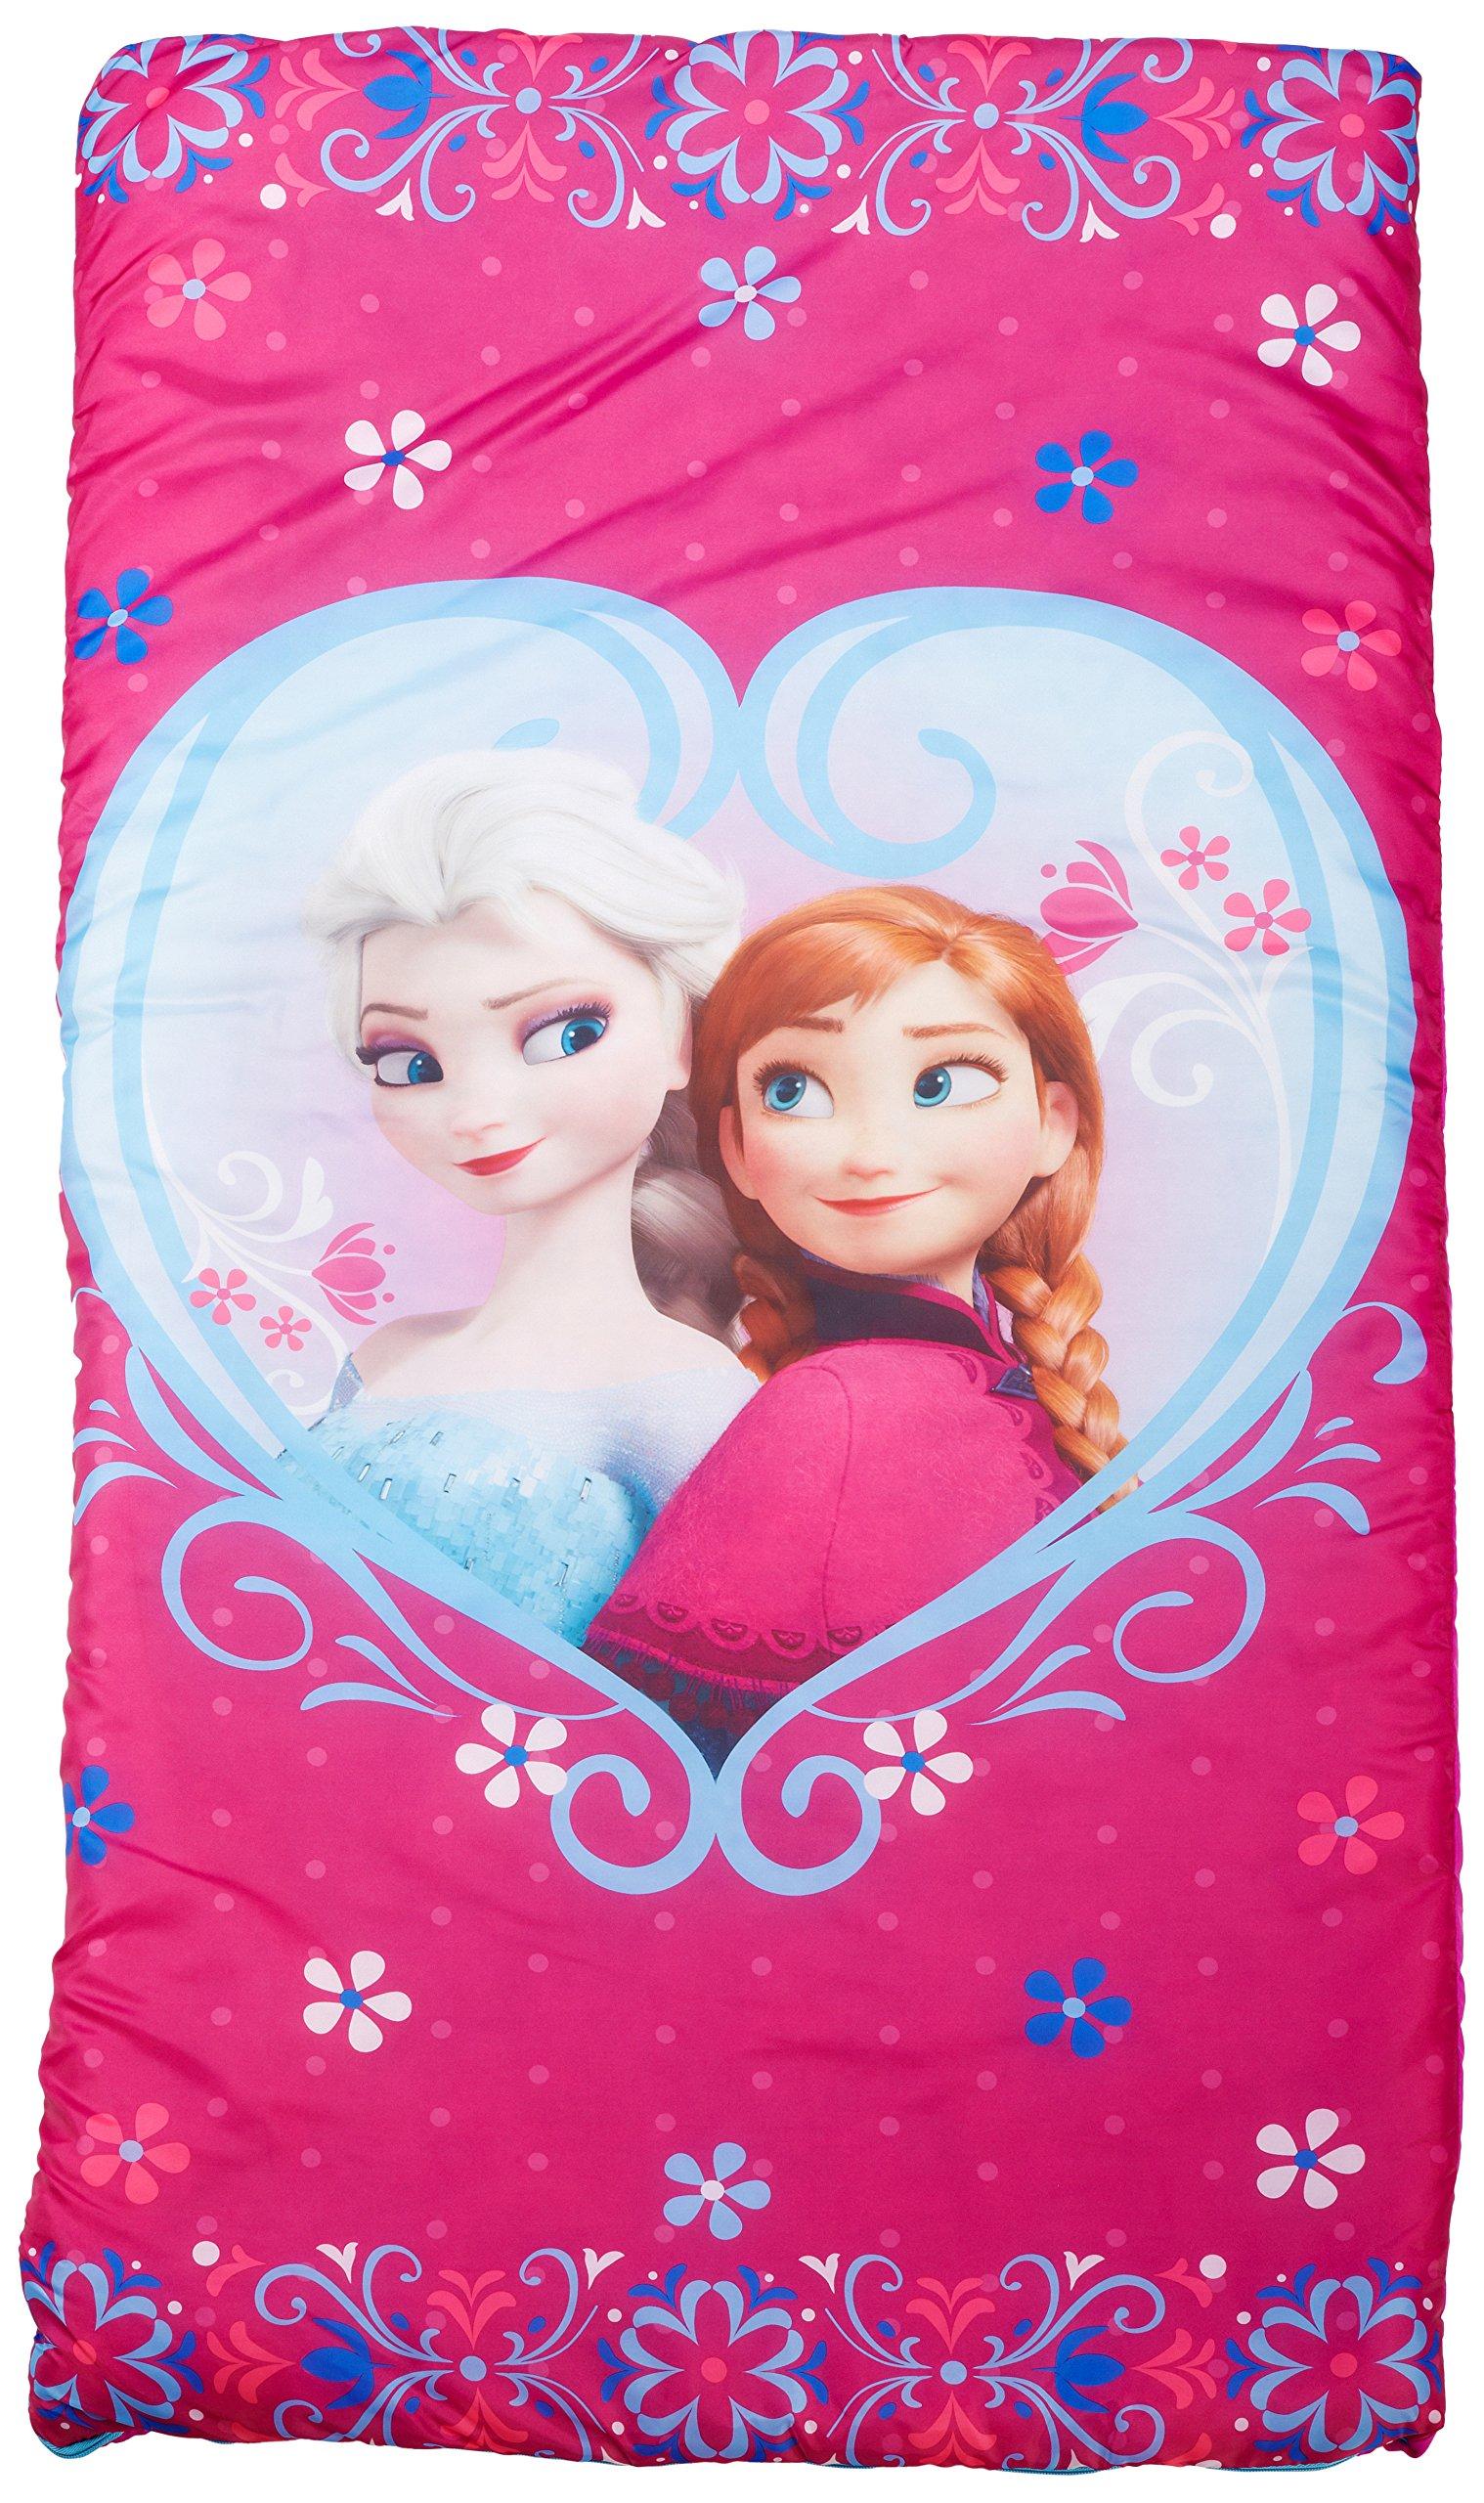 Disney Frozen Anna and Elsa Slumberbag, 30 X 54, Pink by Jay Franco (Image #1)